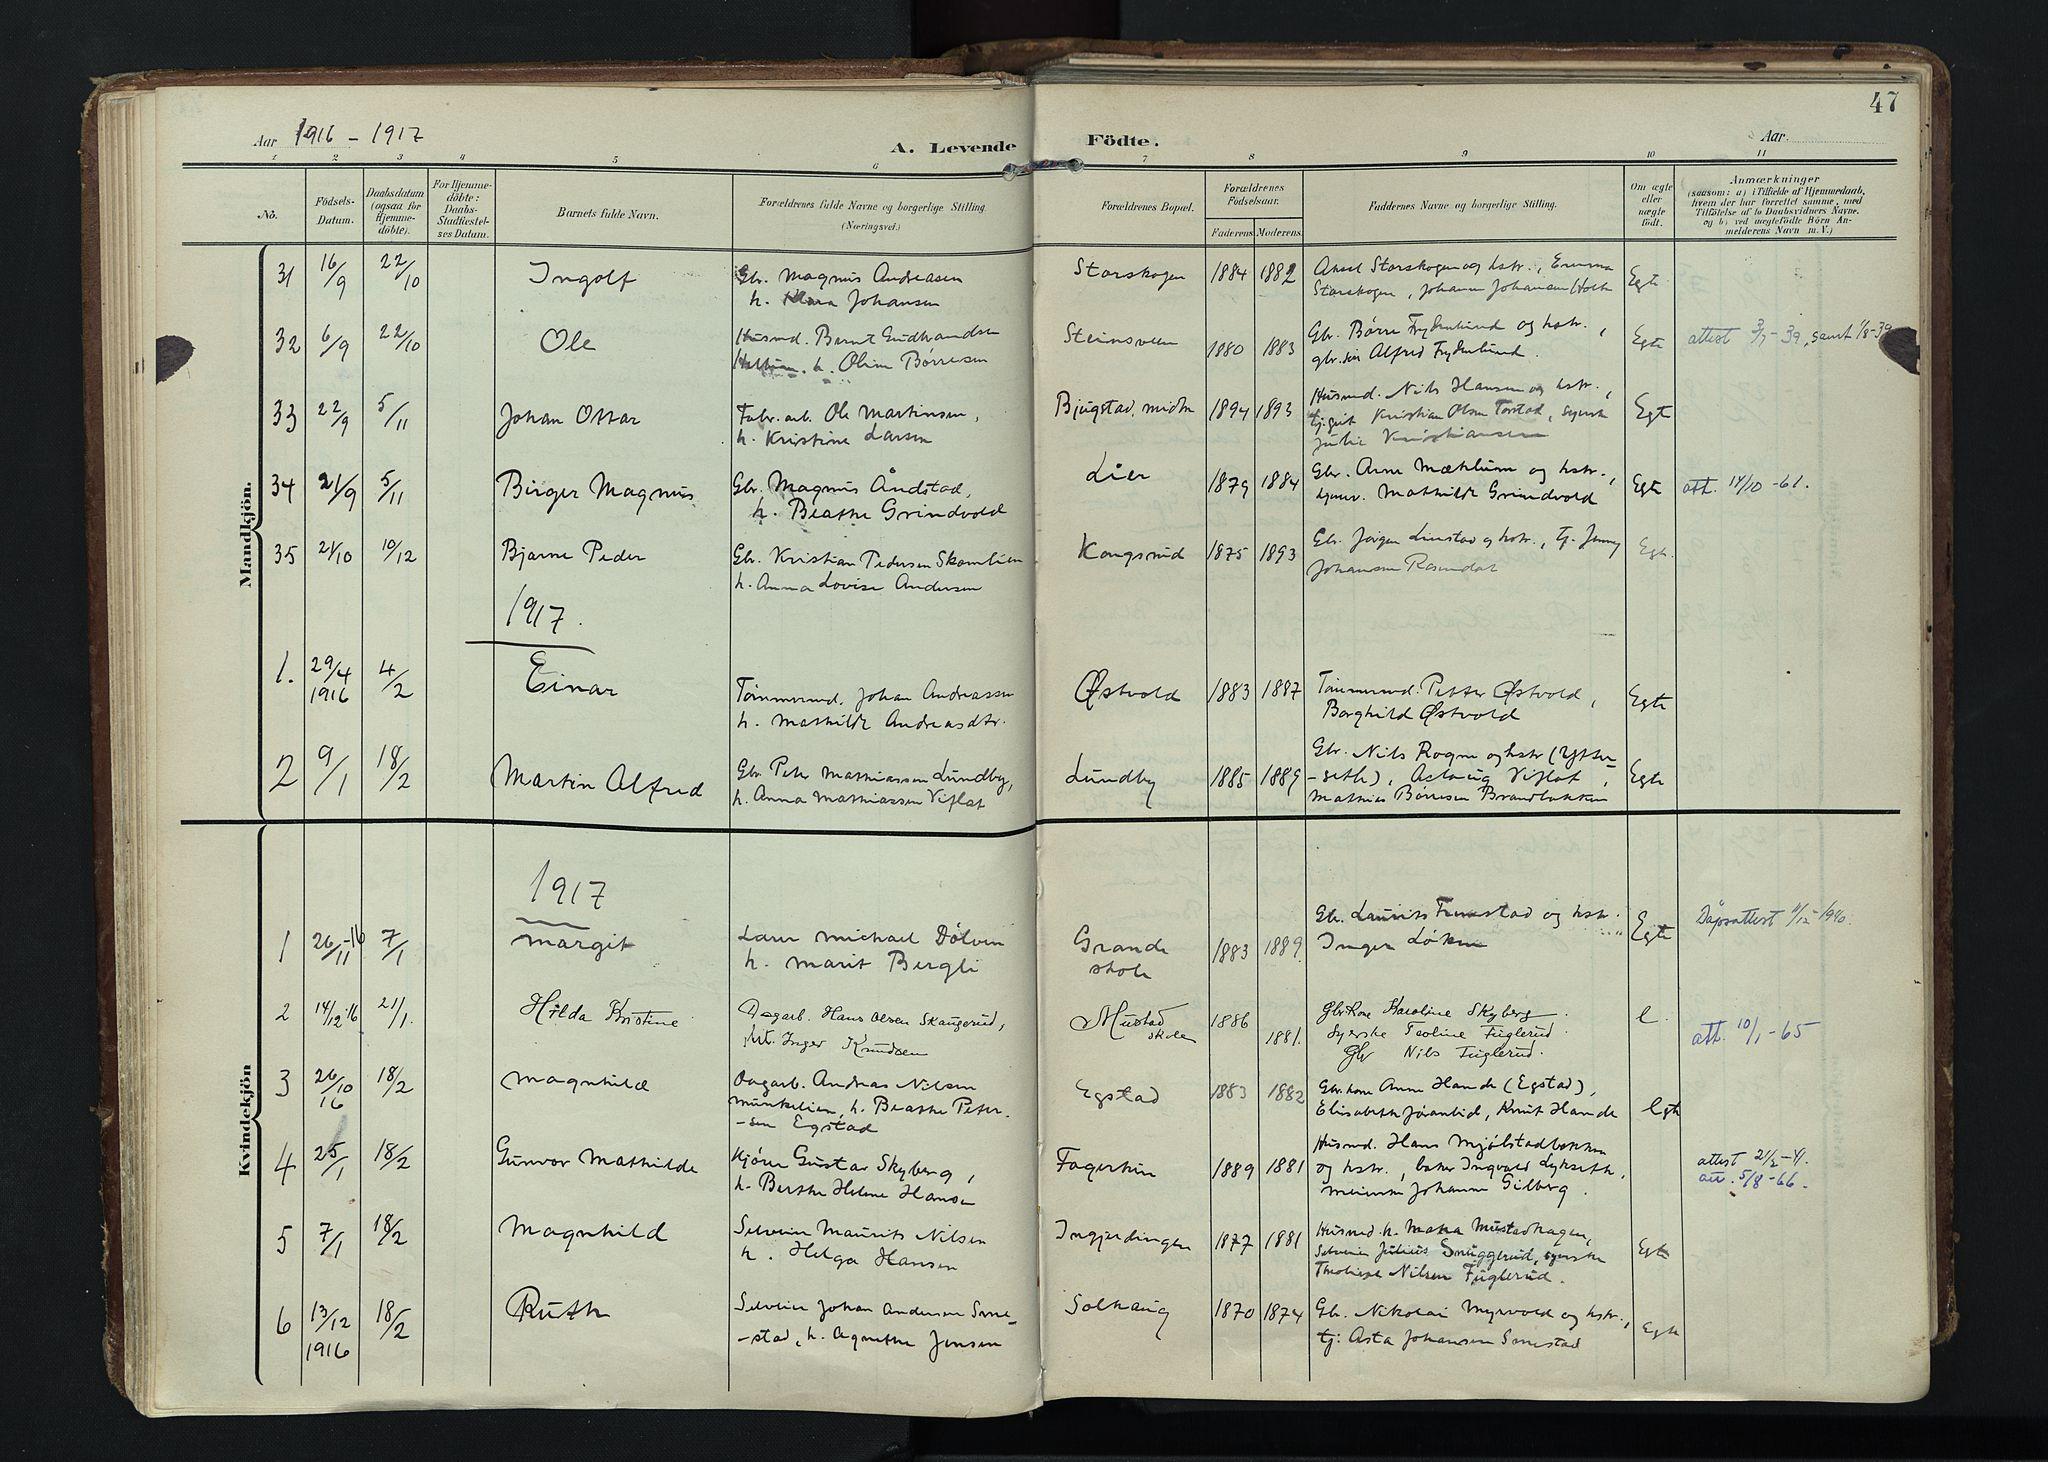 SAH, Vardal prestekontor, H/Ha/Haa/L0020: Ministerialbok nr. 20, 1907-1921, s. 47